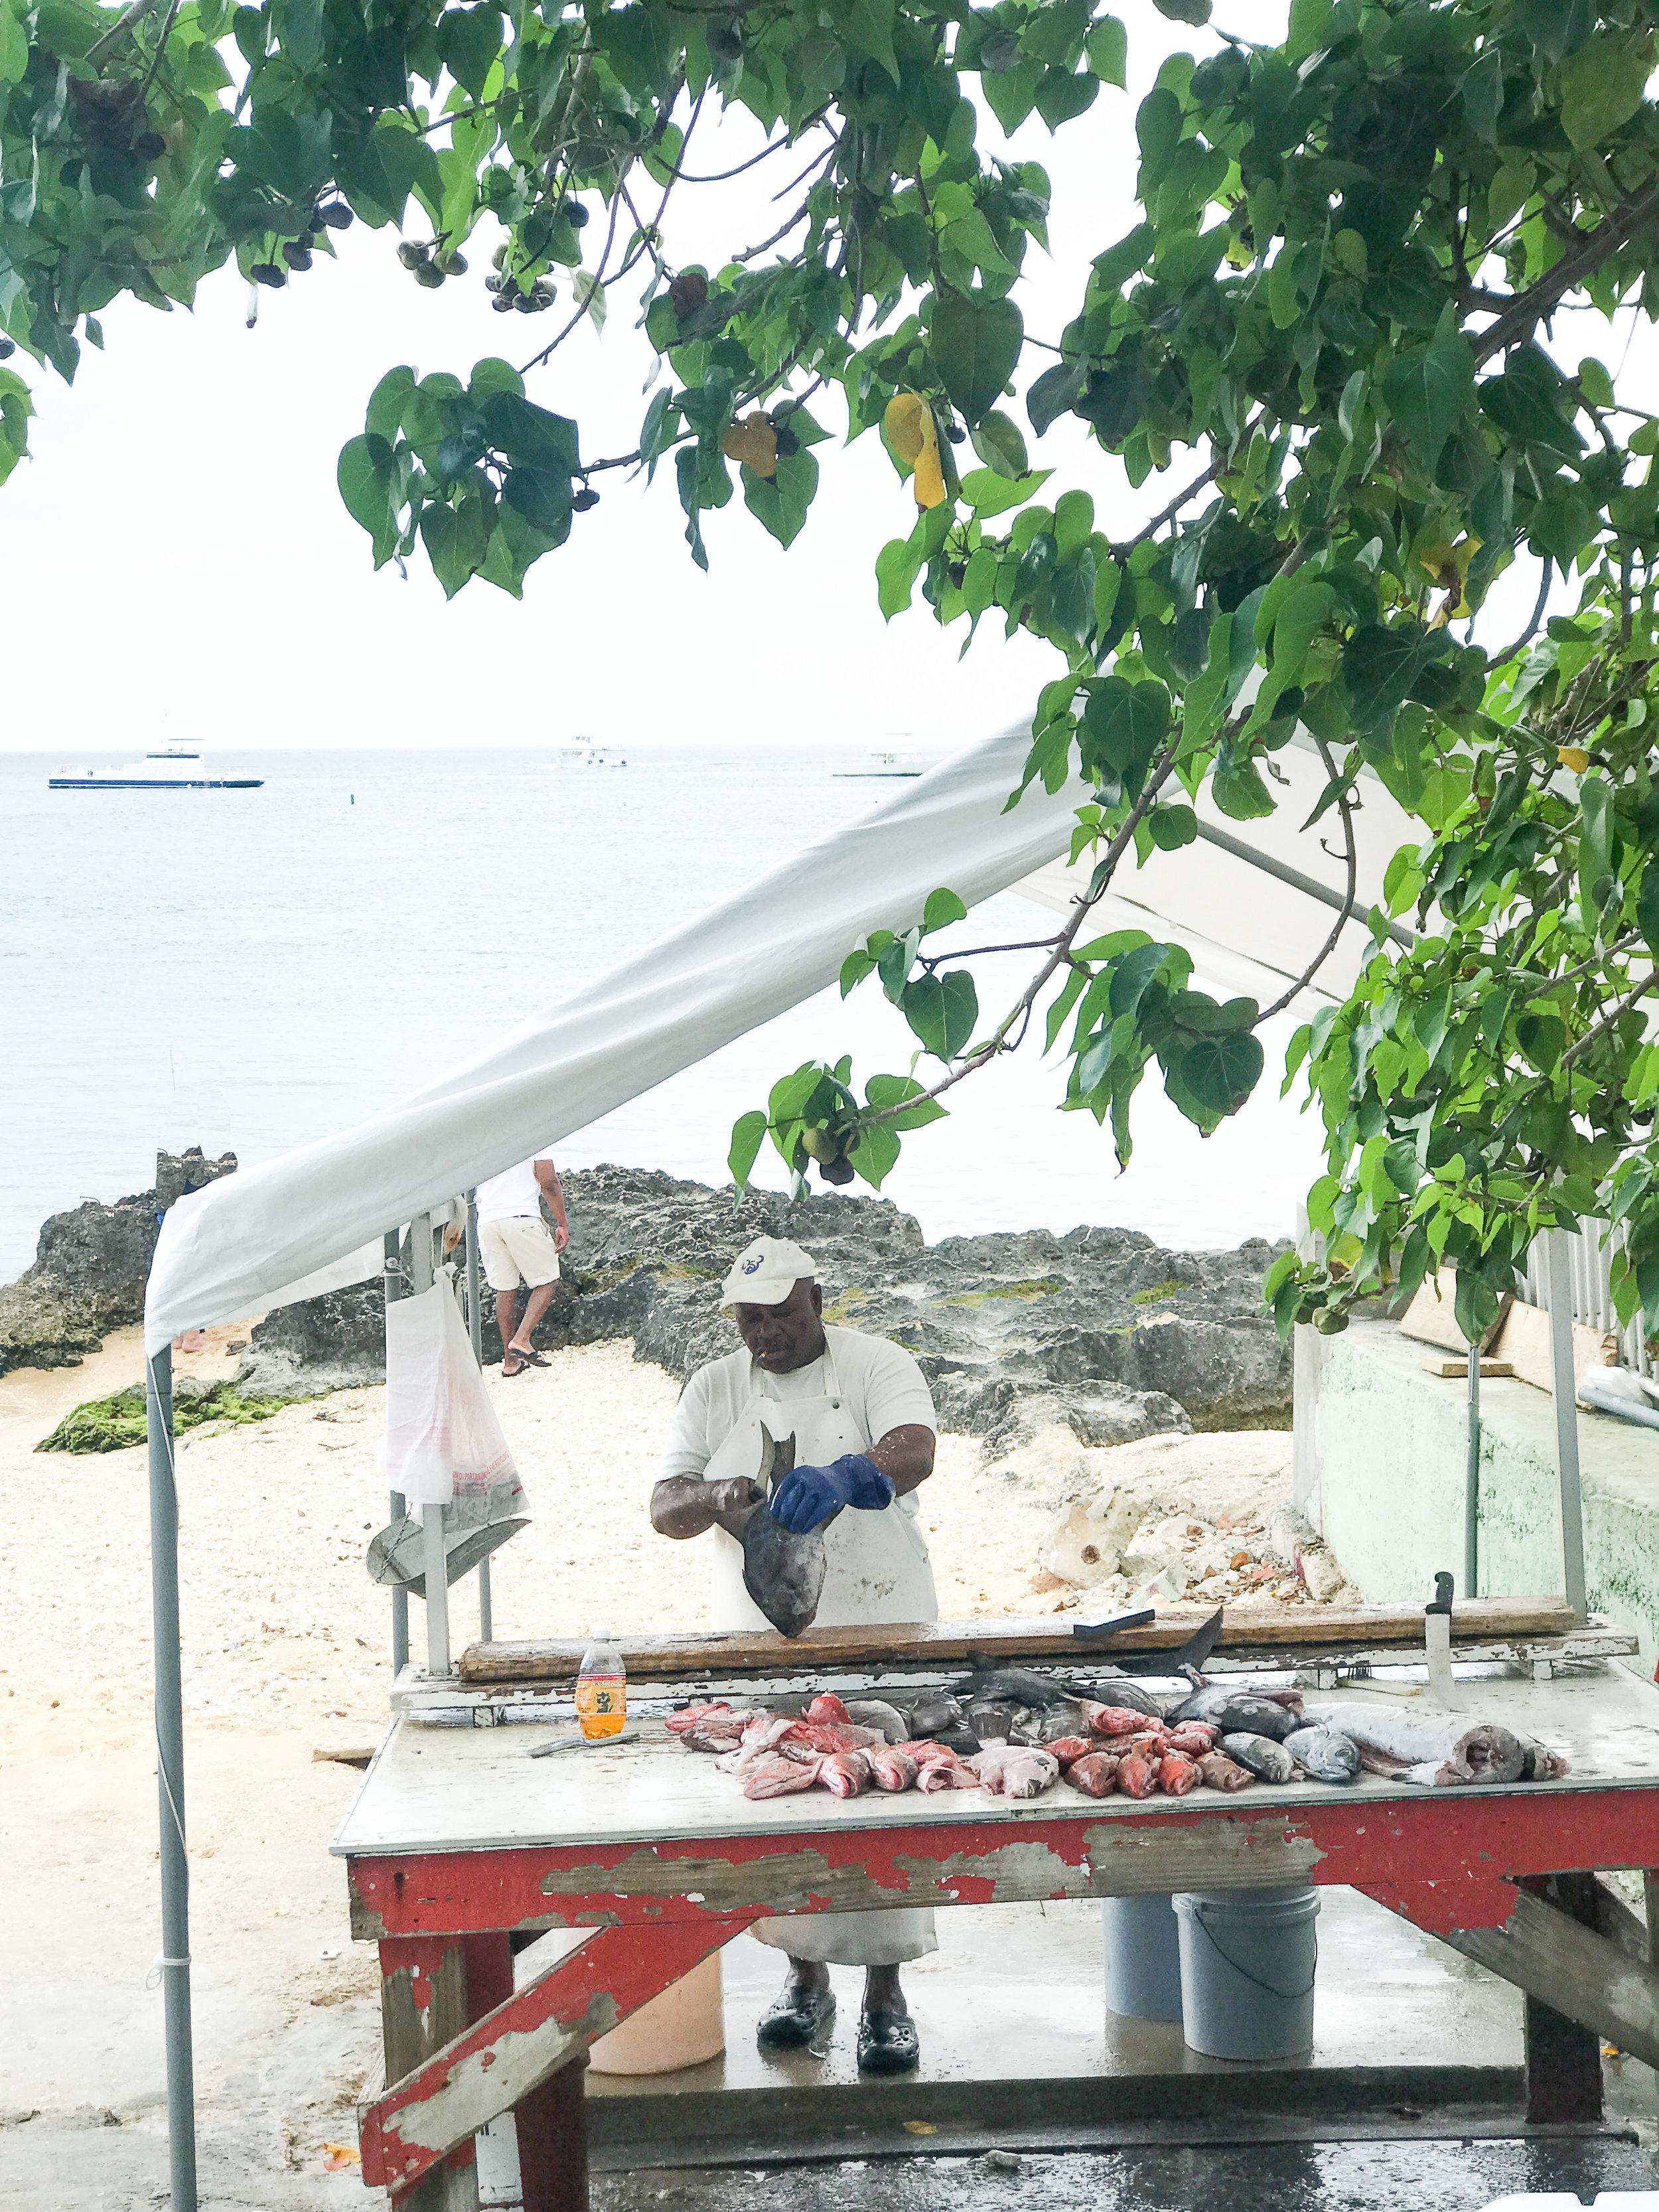 Fish Market at the Harbor